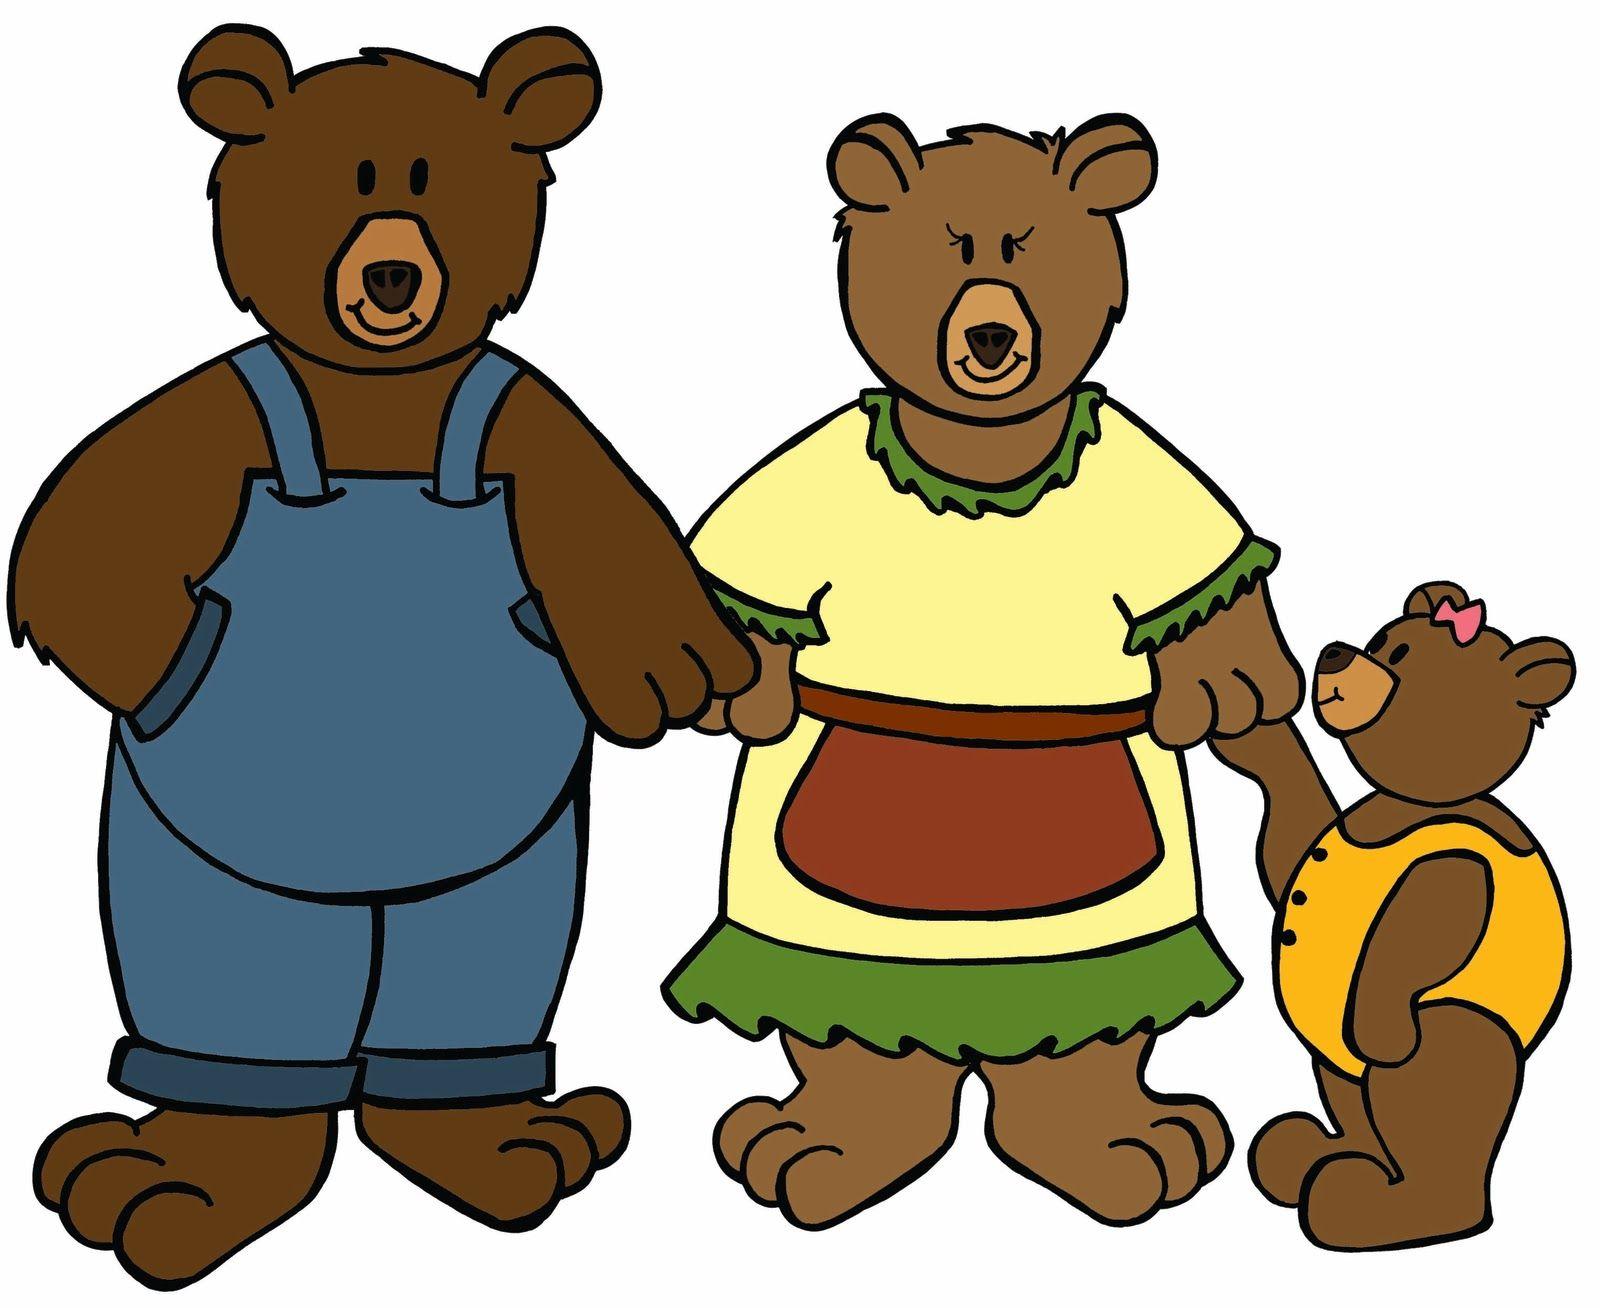 goldilocks and the three bears clipart cliparts co goudlokje en de rh pinterest com au goldilocks cute clipart goldilocks clipart